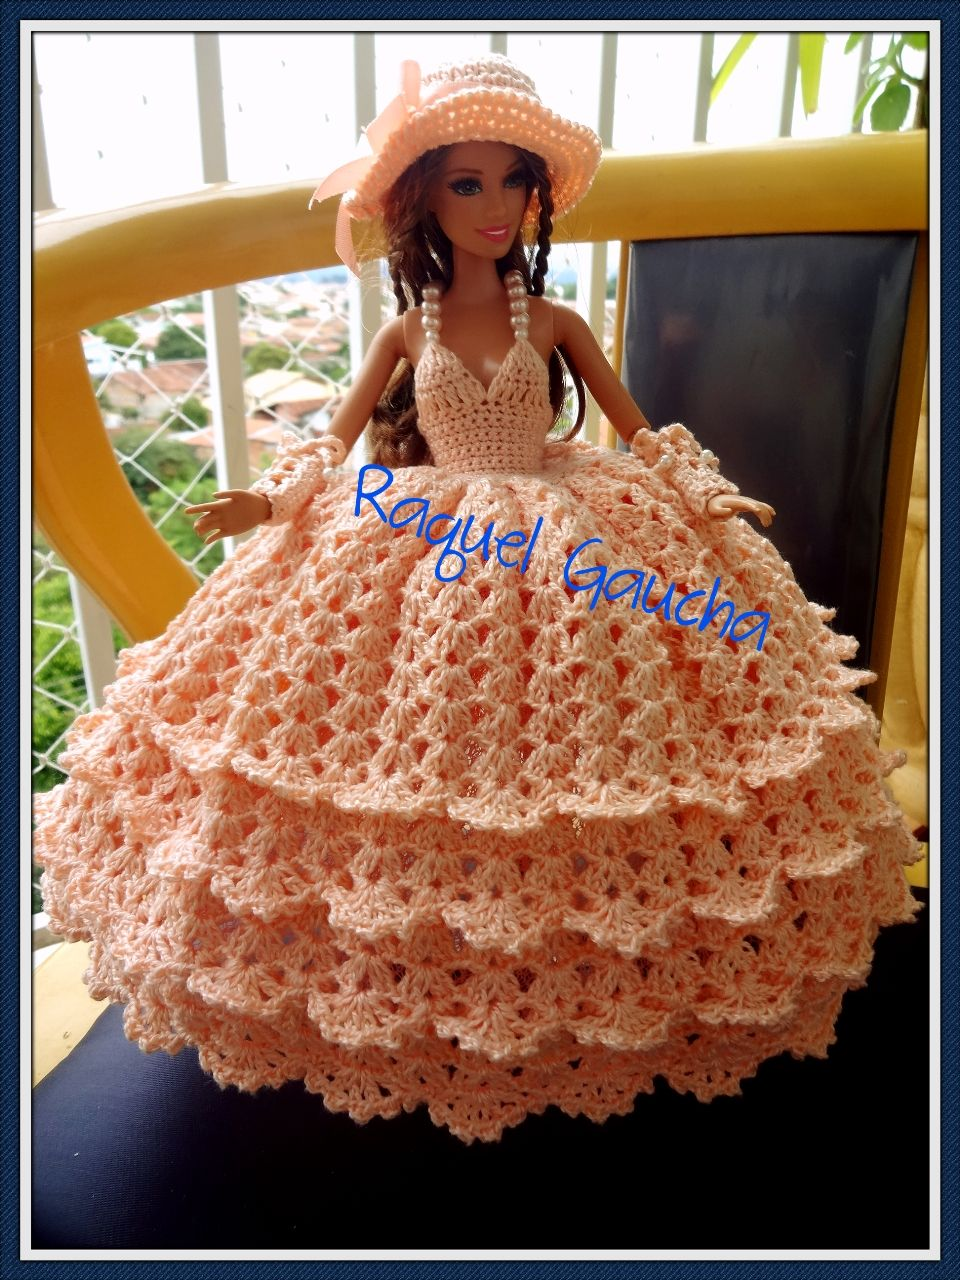 Pin von Florence Petrik auf Crochet | Pinterest | Barbie ...